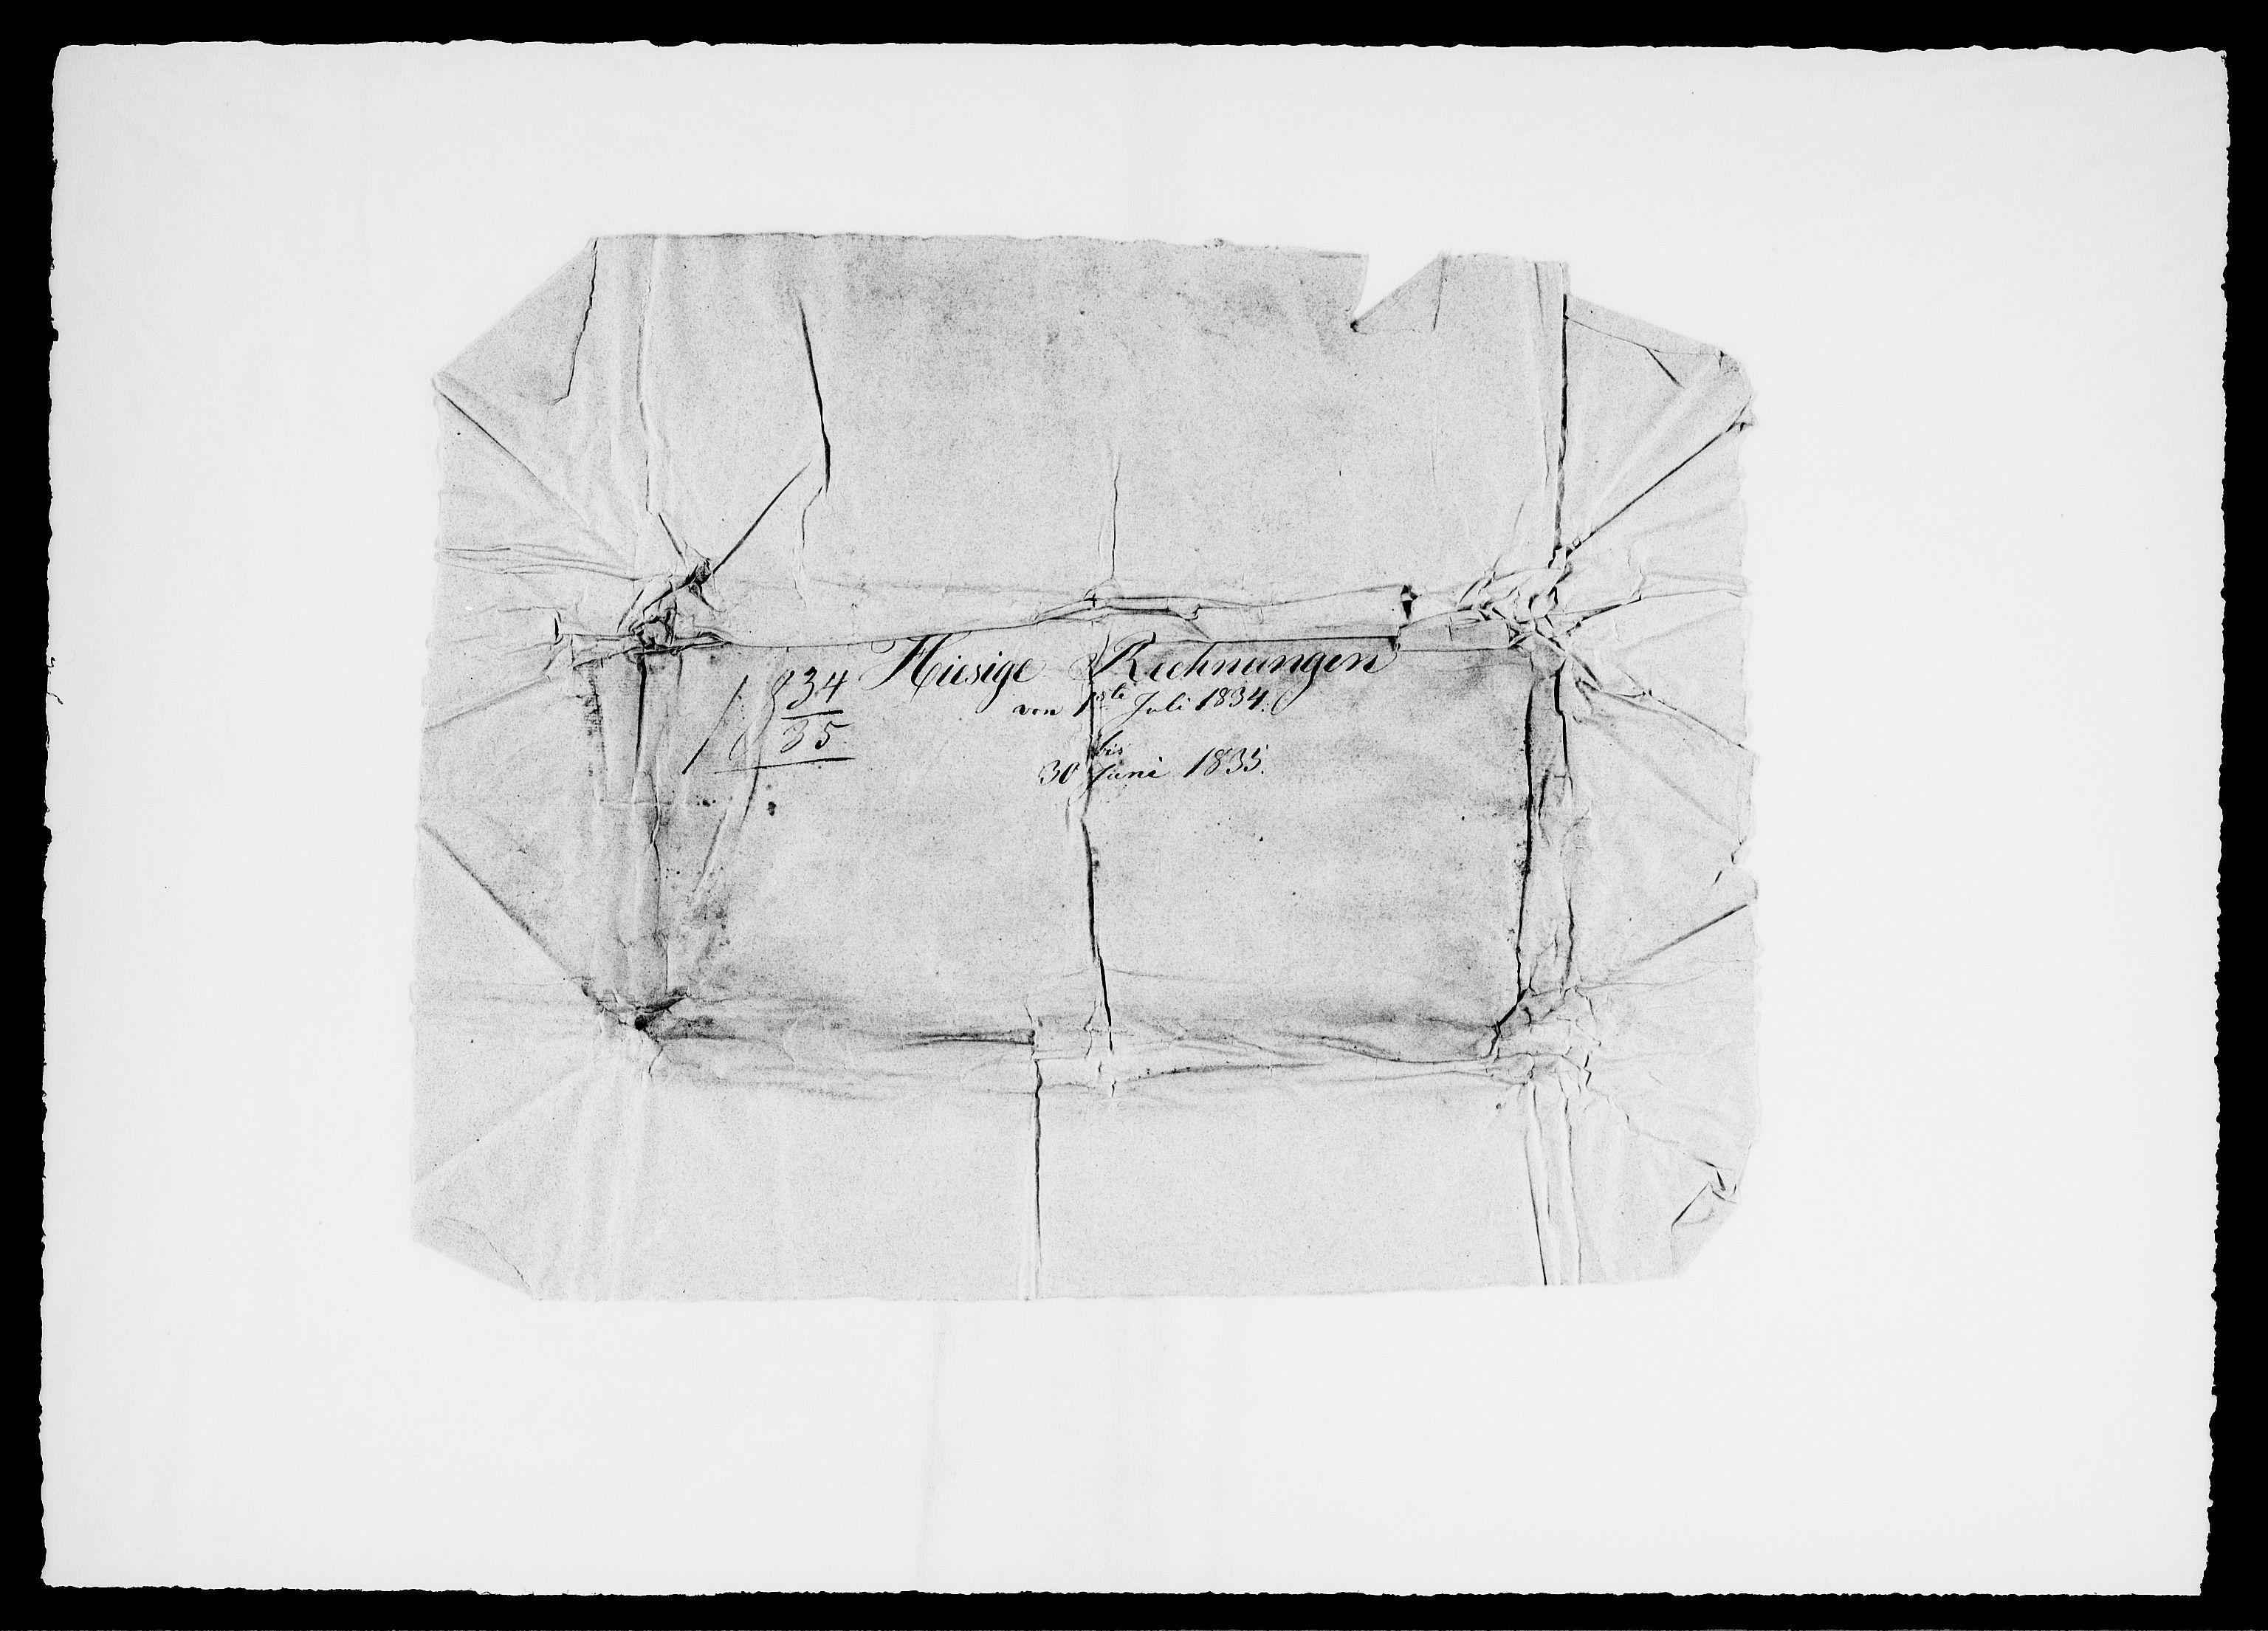 RA, Modums Blaafarveværk, G/Gd/Gdc/L0218, 1834-1838, s. 2